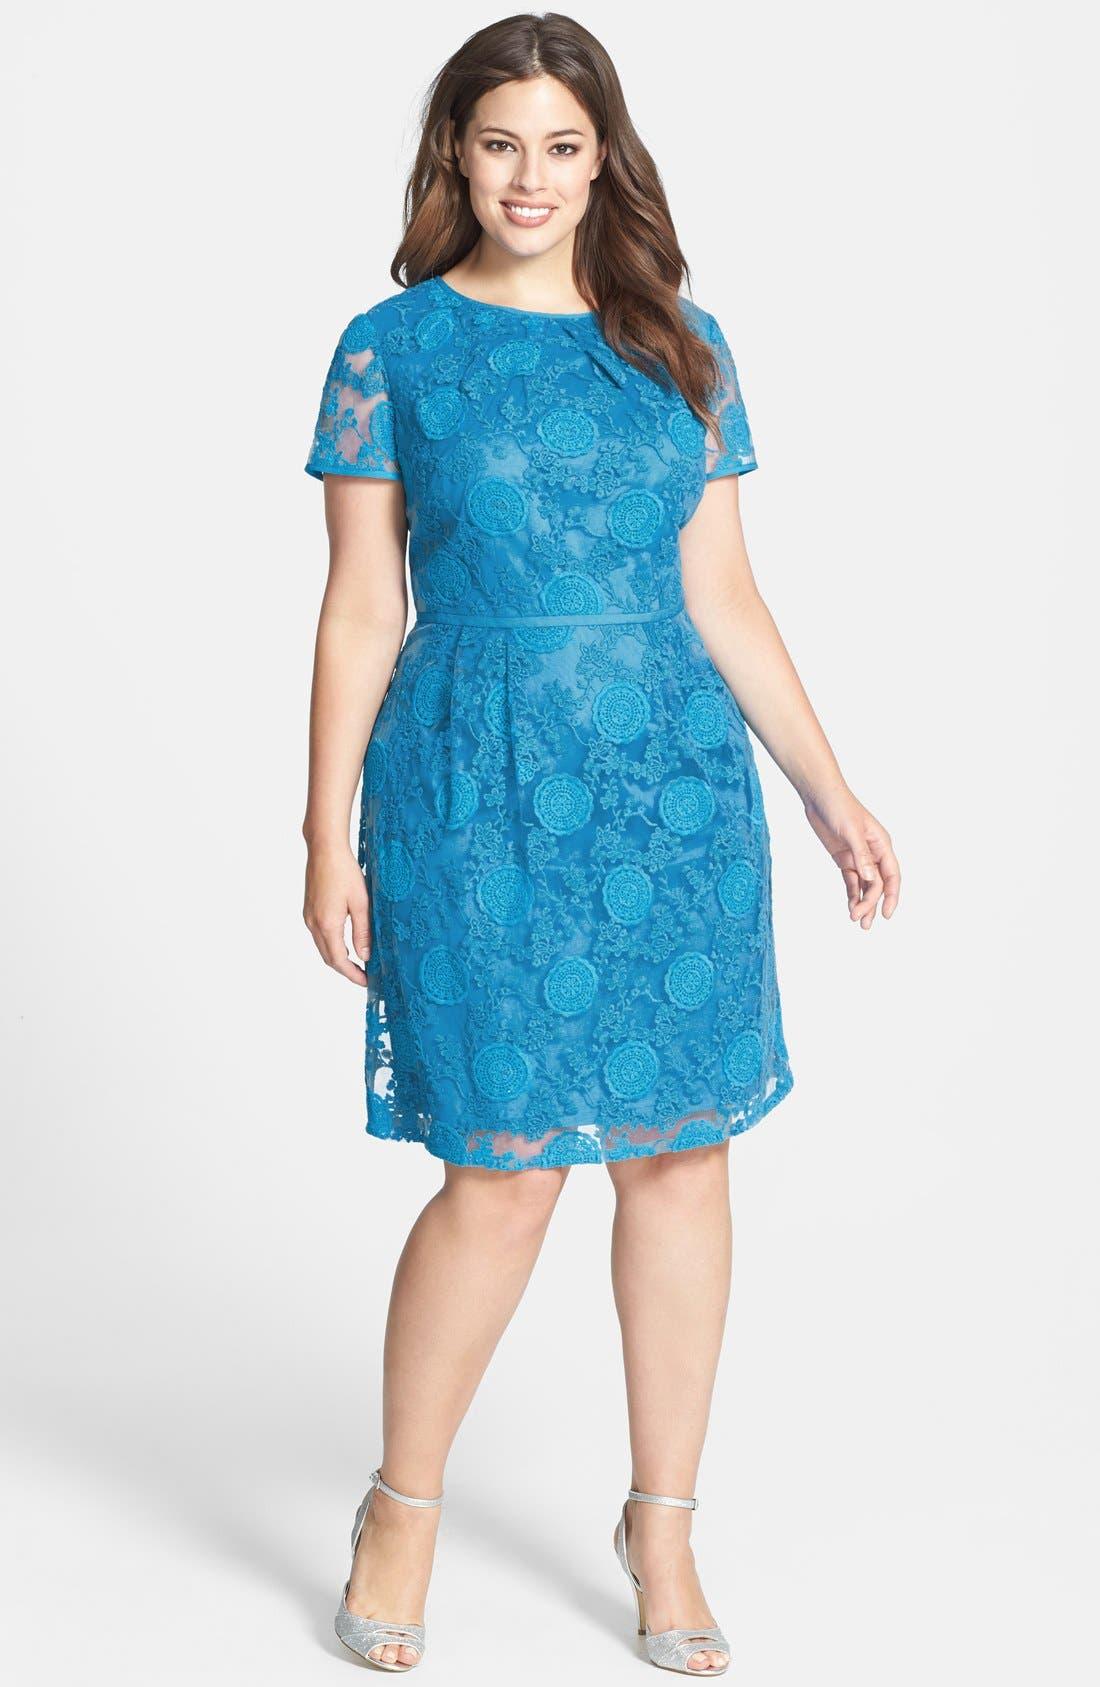 Main Image - Adrianna Papell 'Pleats' Lace Dress (Plus Size)